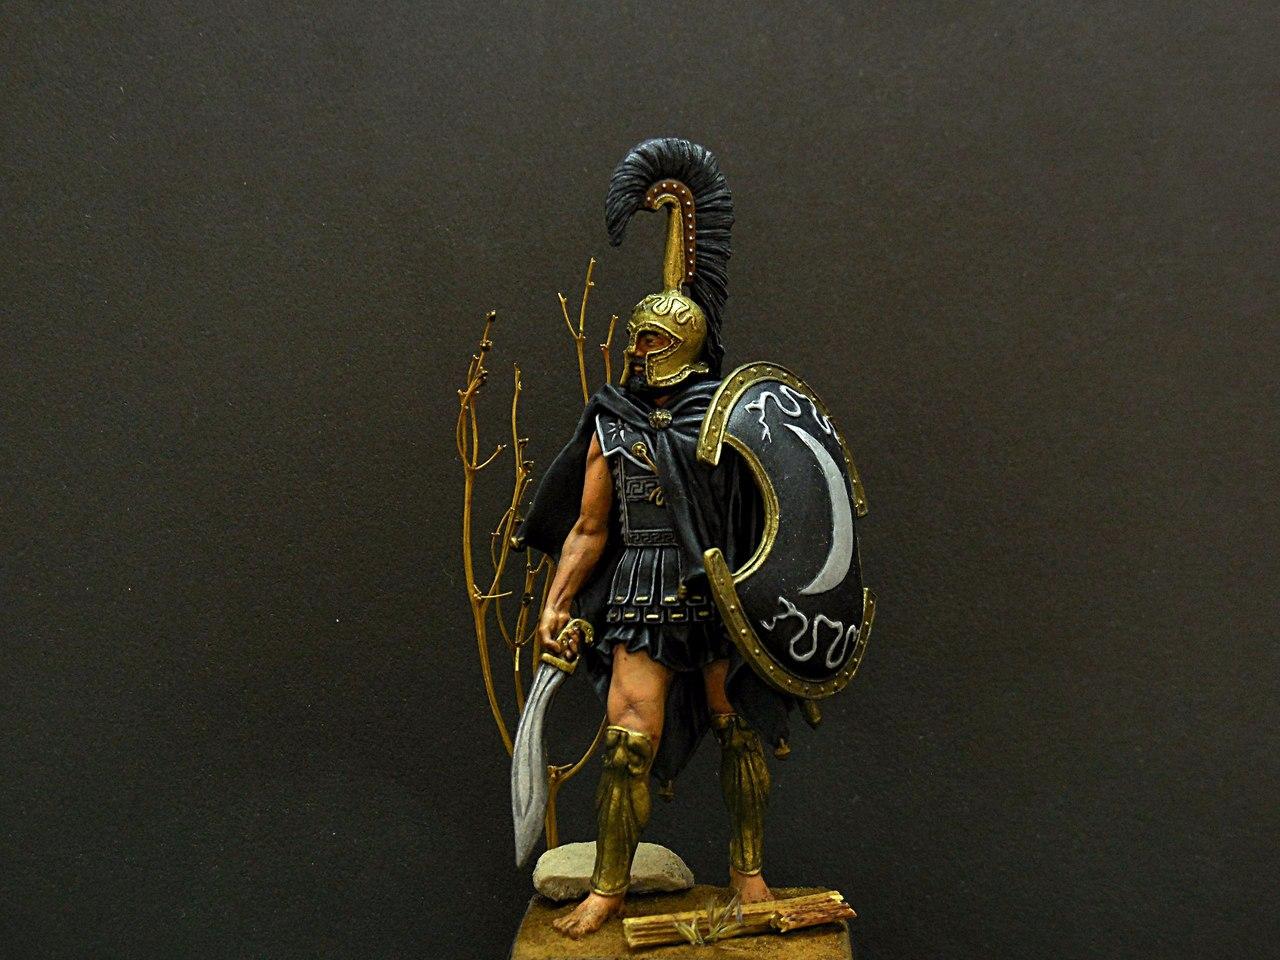 Figures: Thespian hoplite, photo #2